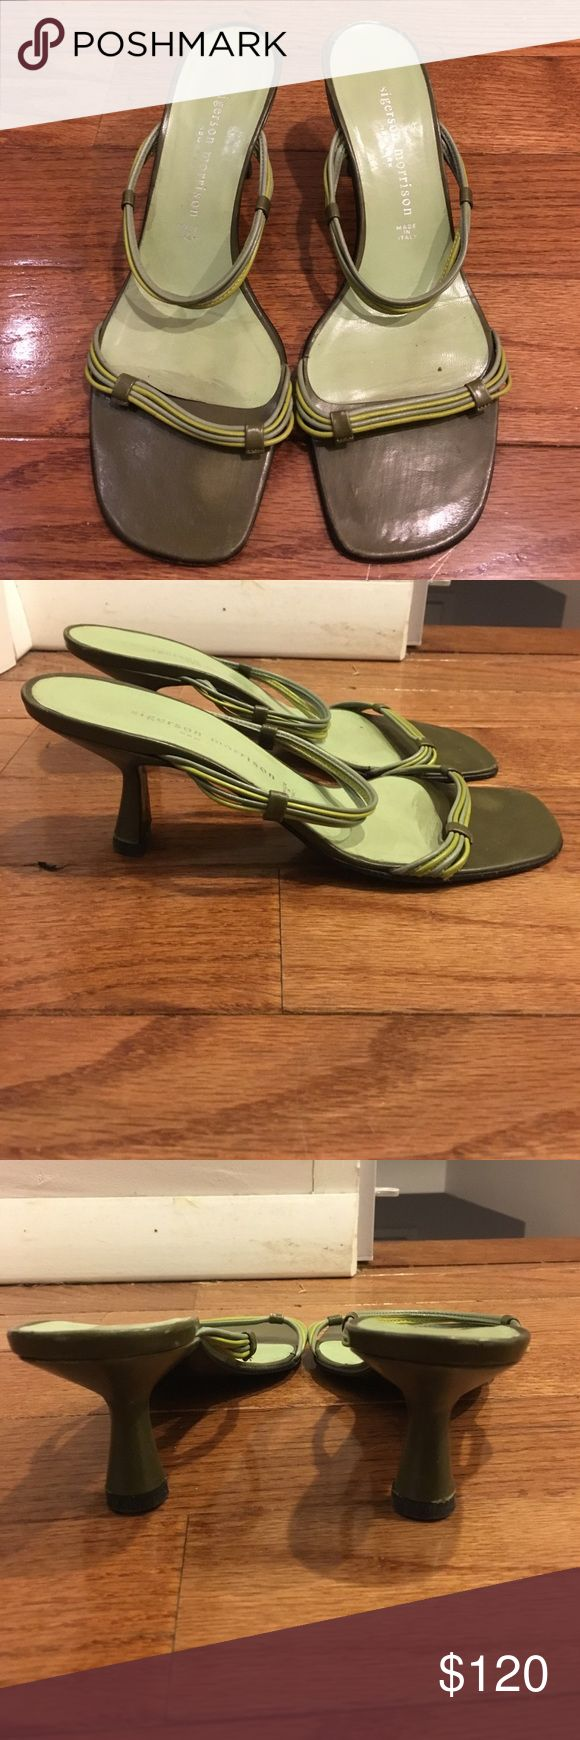 Sigerson Morrison green heels Only been worn a few times Sigerson Morrison Shoes Heels